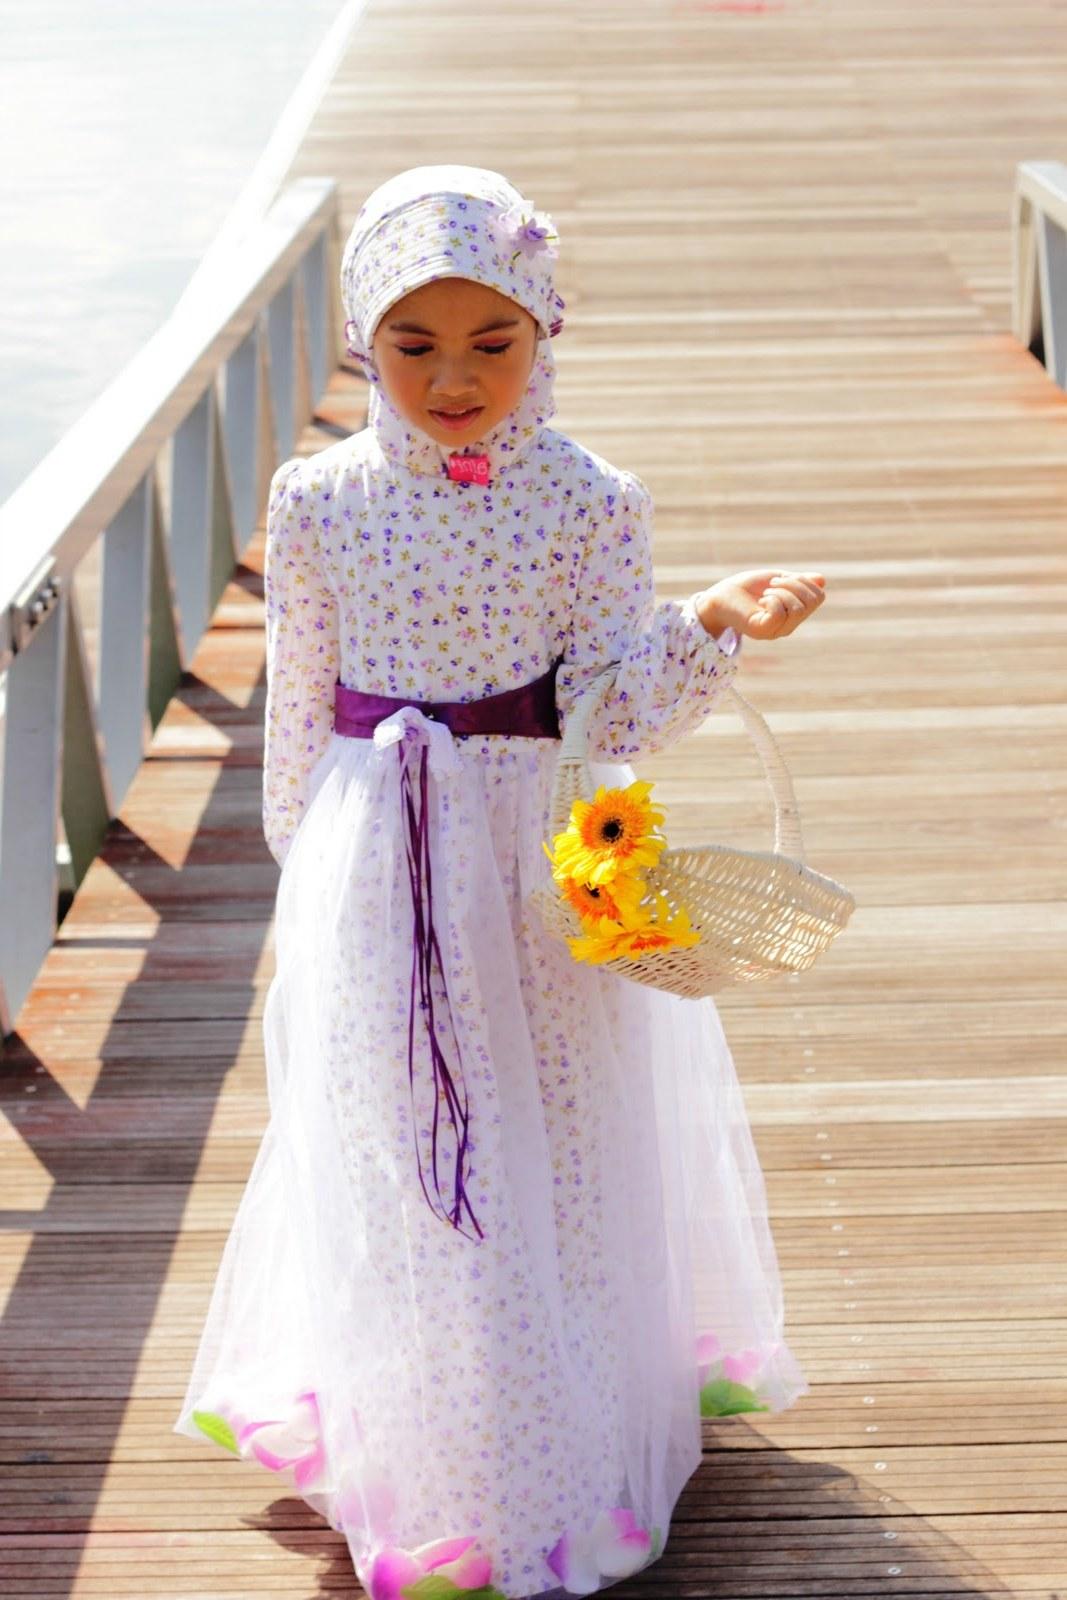 Ide Gaun Pengantin Muslimah Yang Syar'i Fmdf Mylilmuslimah Boutique Gaun Princess Wedding